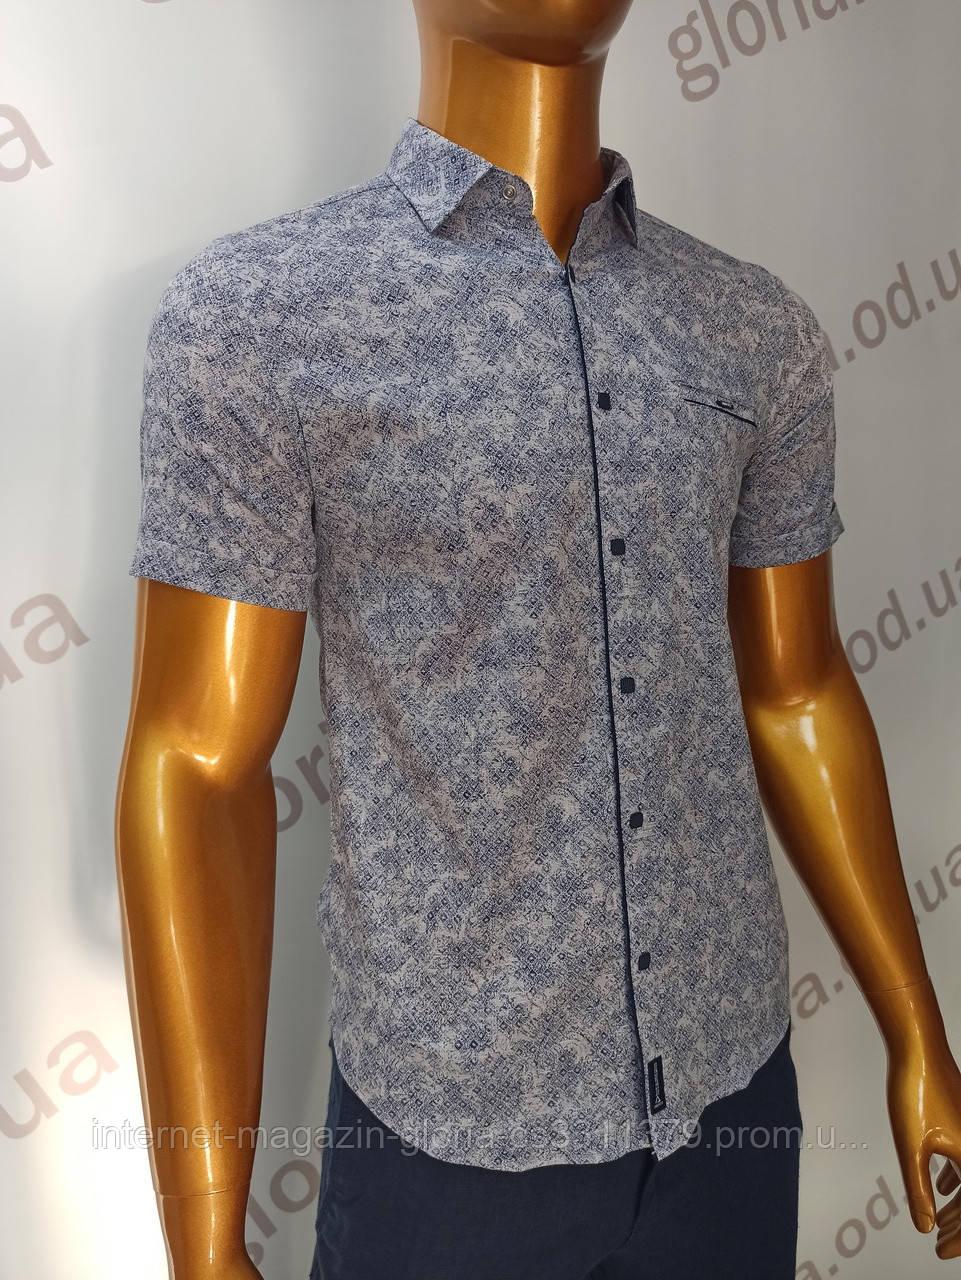 Мужская рубашка Amato. AG.19839(g). Размеры:M,L,XL, XXL.